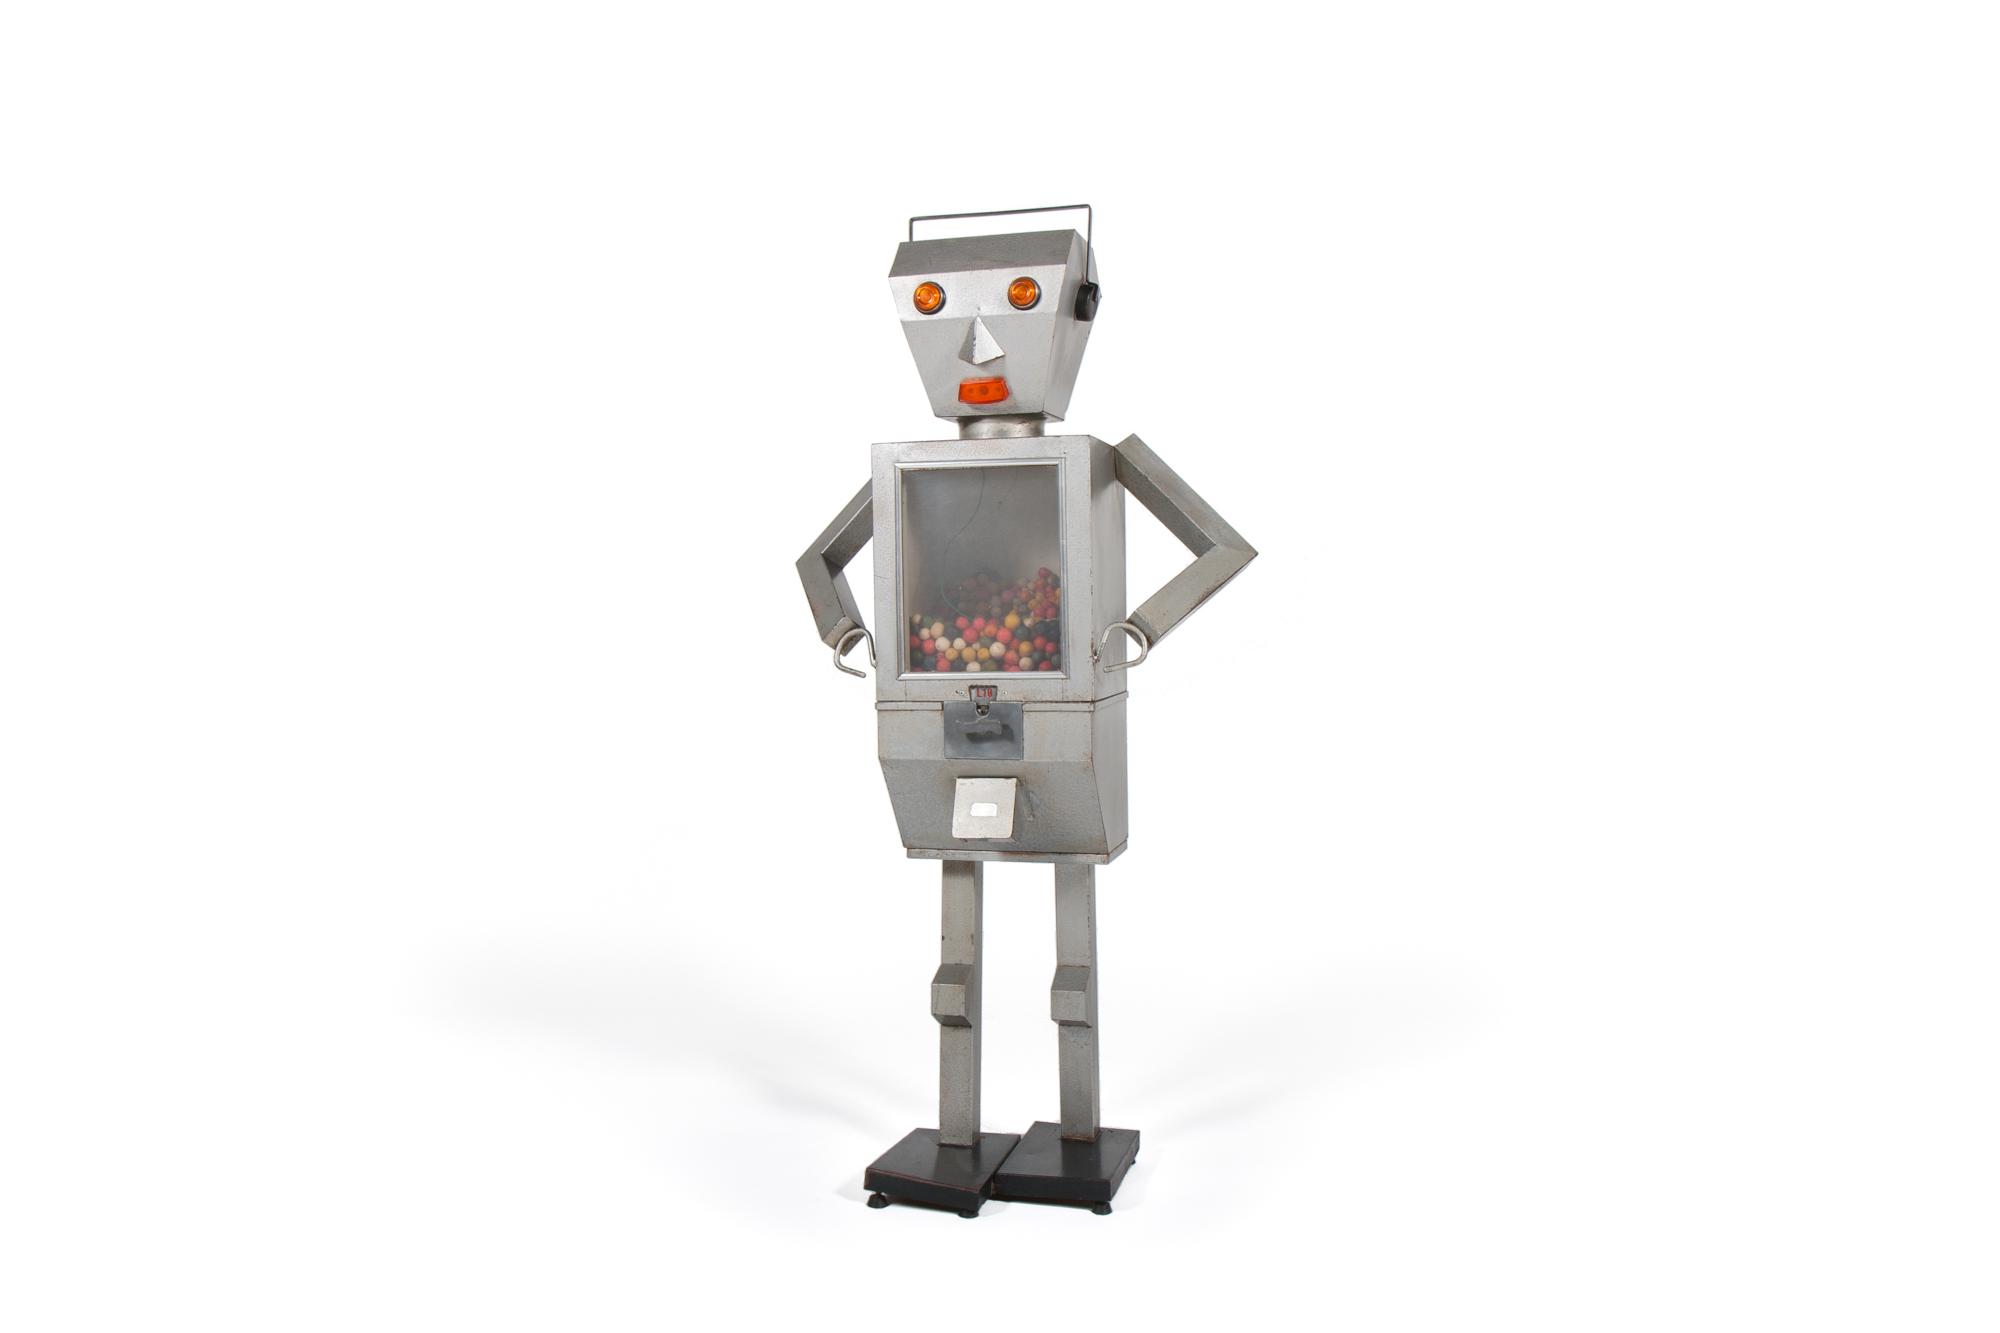 """Gumbo the Robot Gum Dispenser"" (Italy circa 1965) - Height 4' 7"""